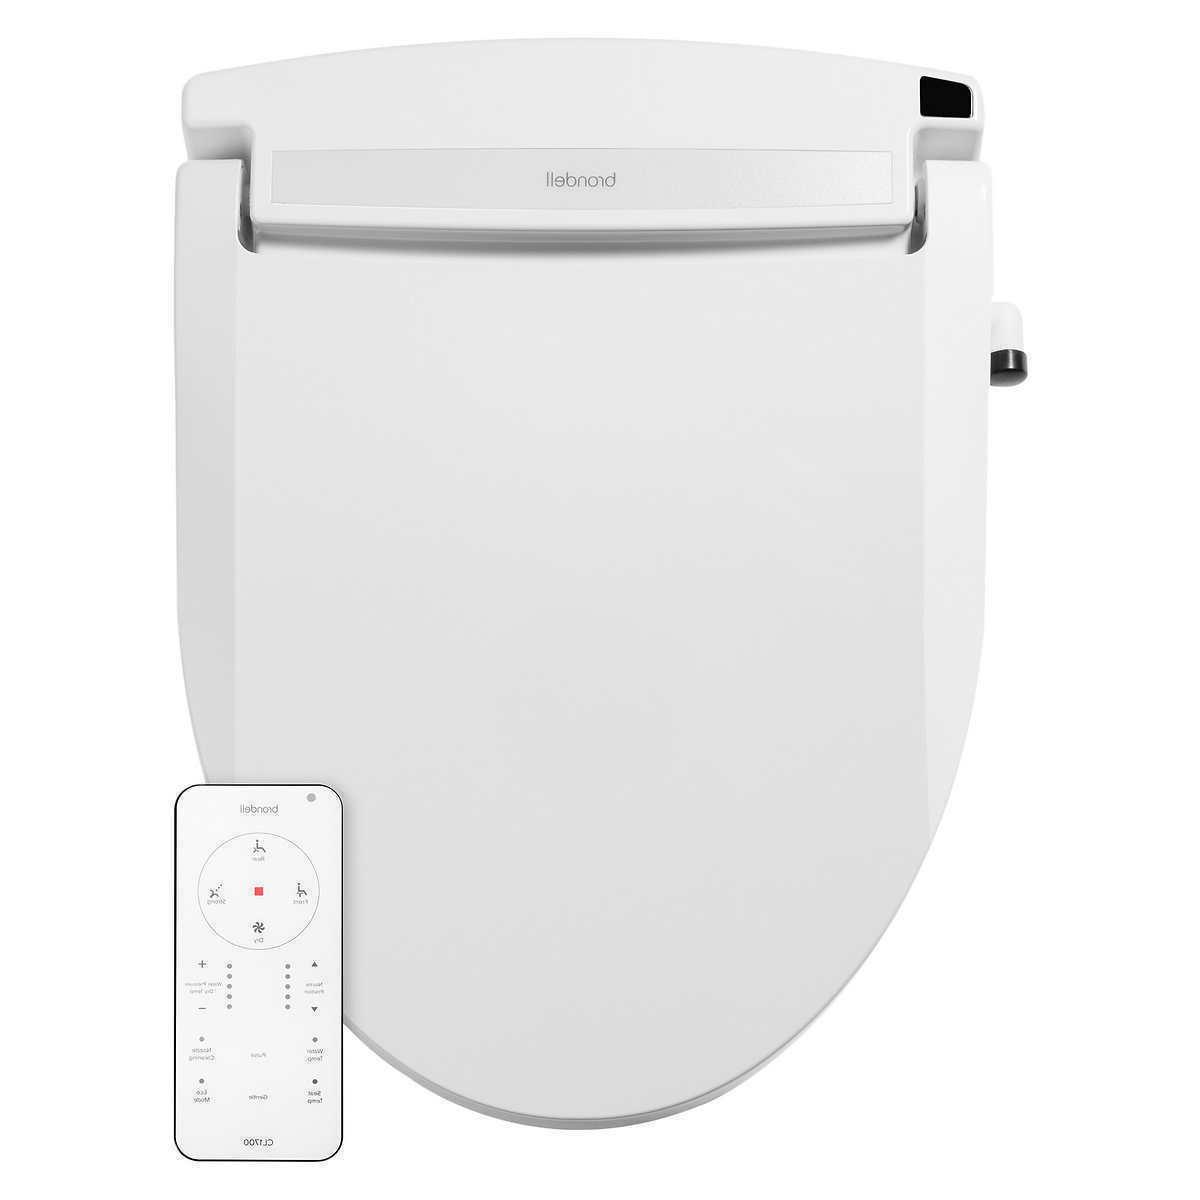 swash cl1700 bidet toilet seat heated soft